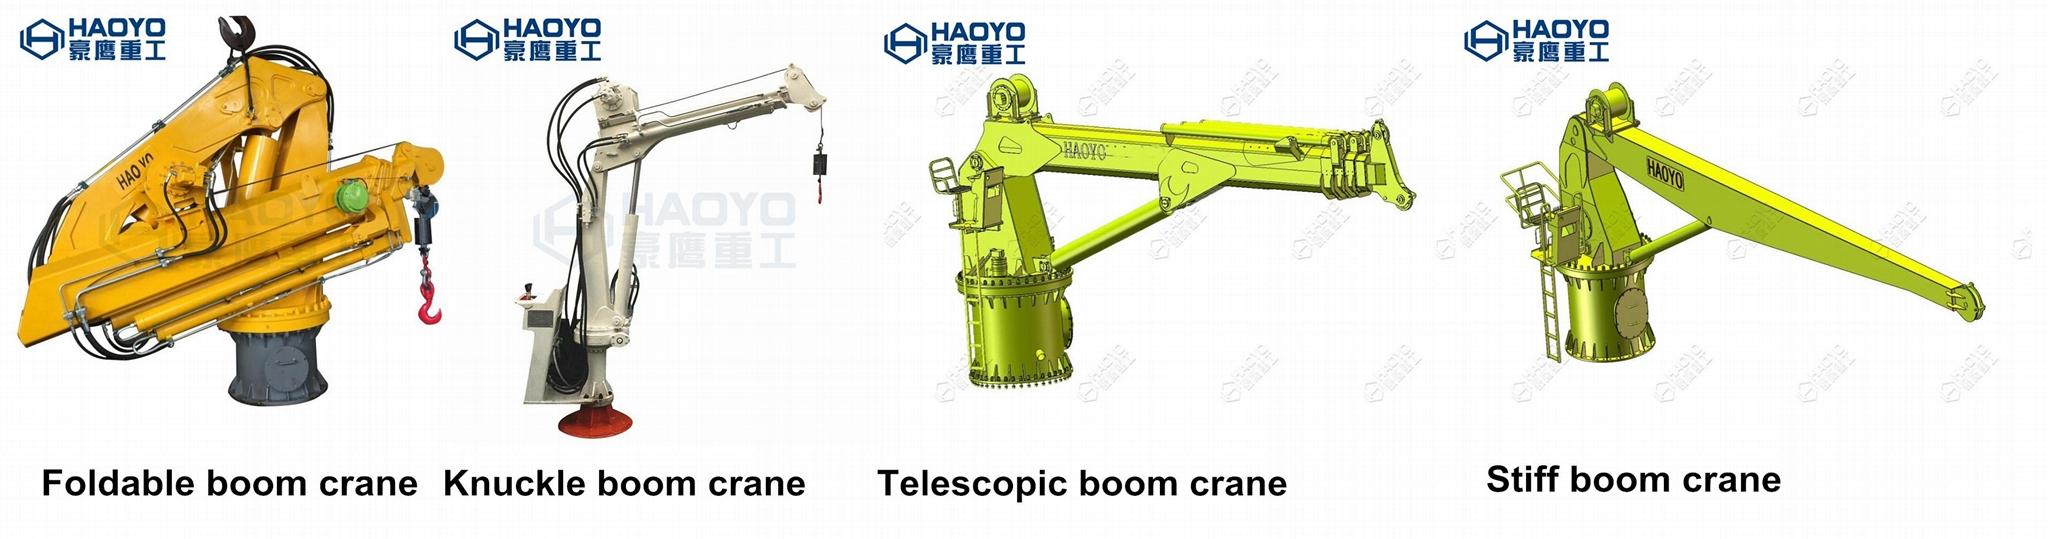 Hydraulic Knuckle Boom Marine Crane for sale 8